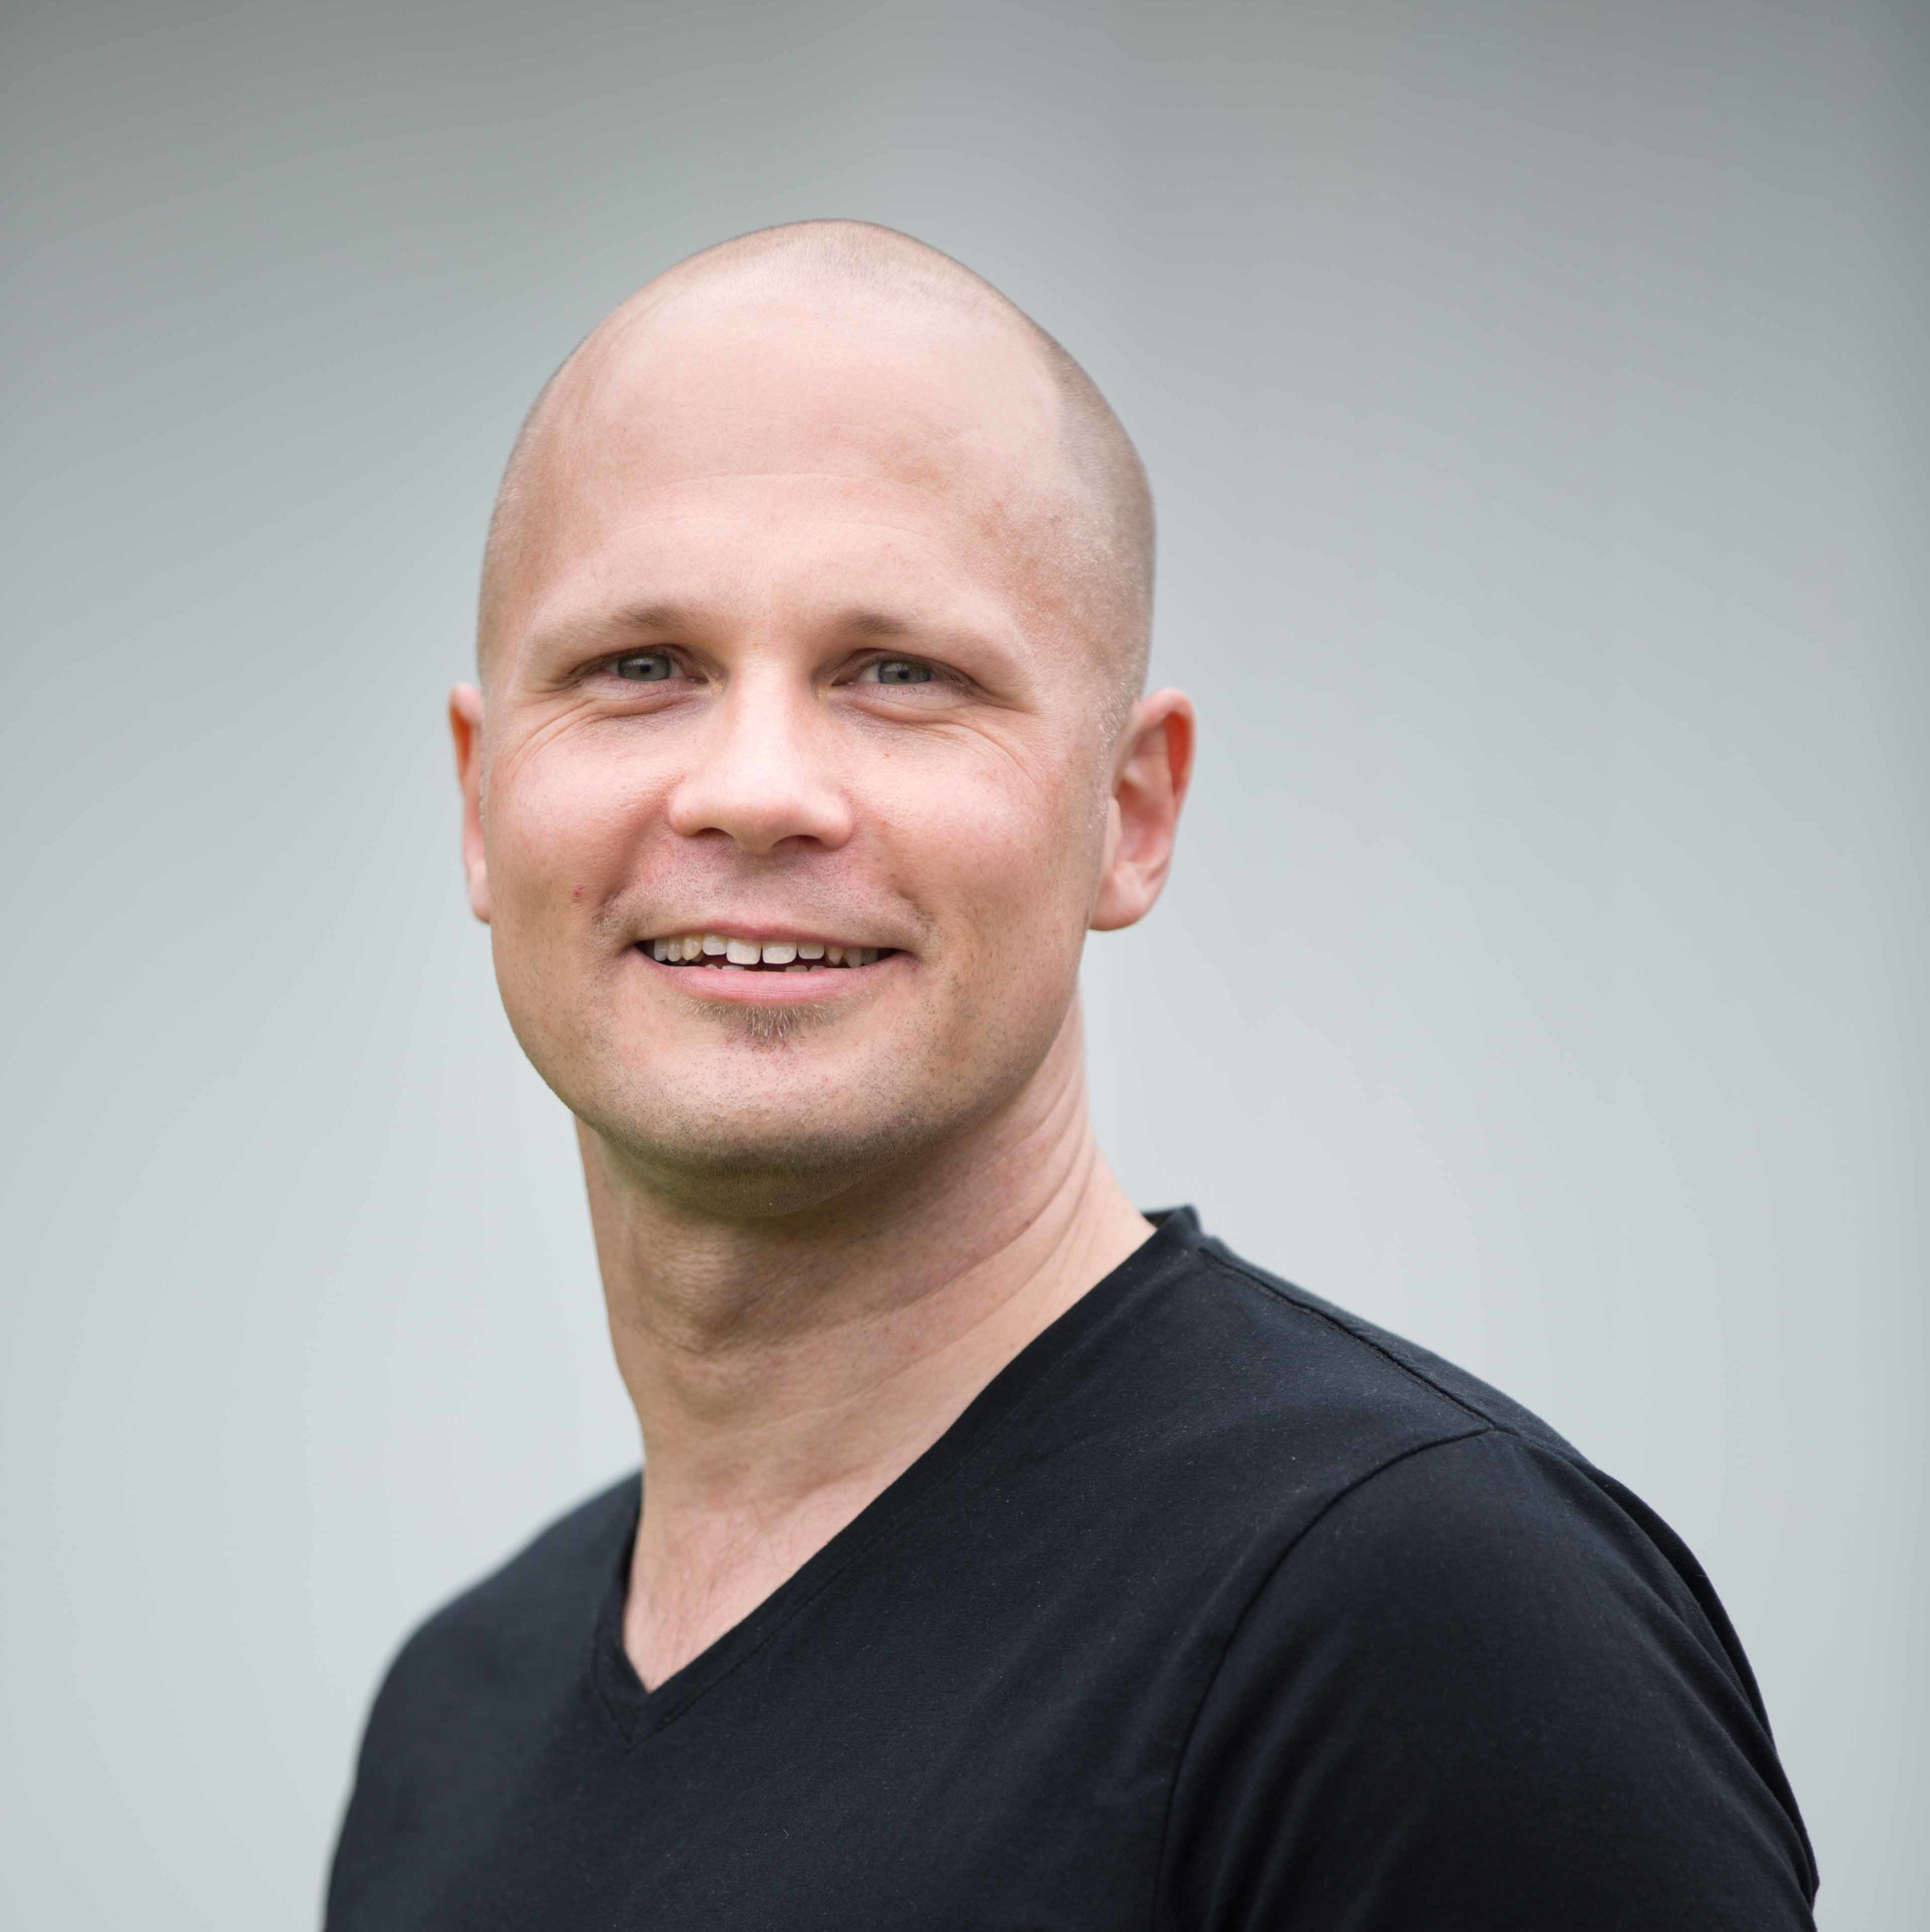 Mattias Neve